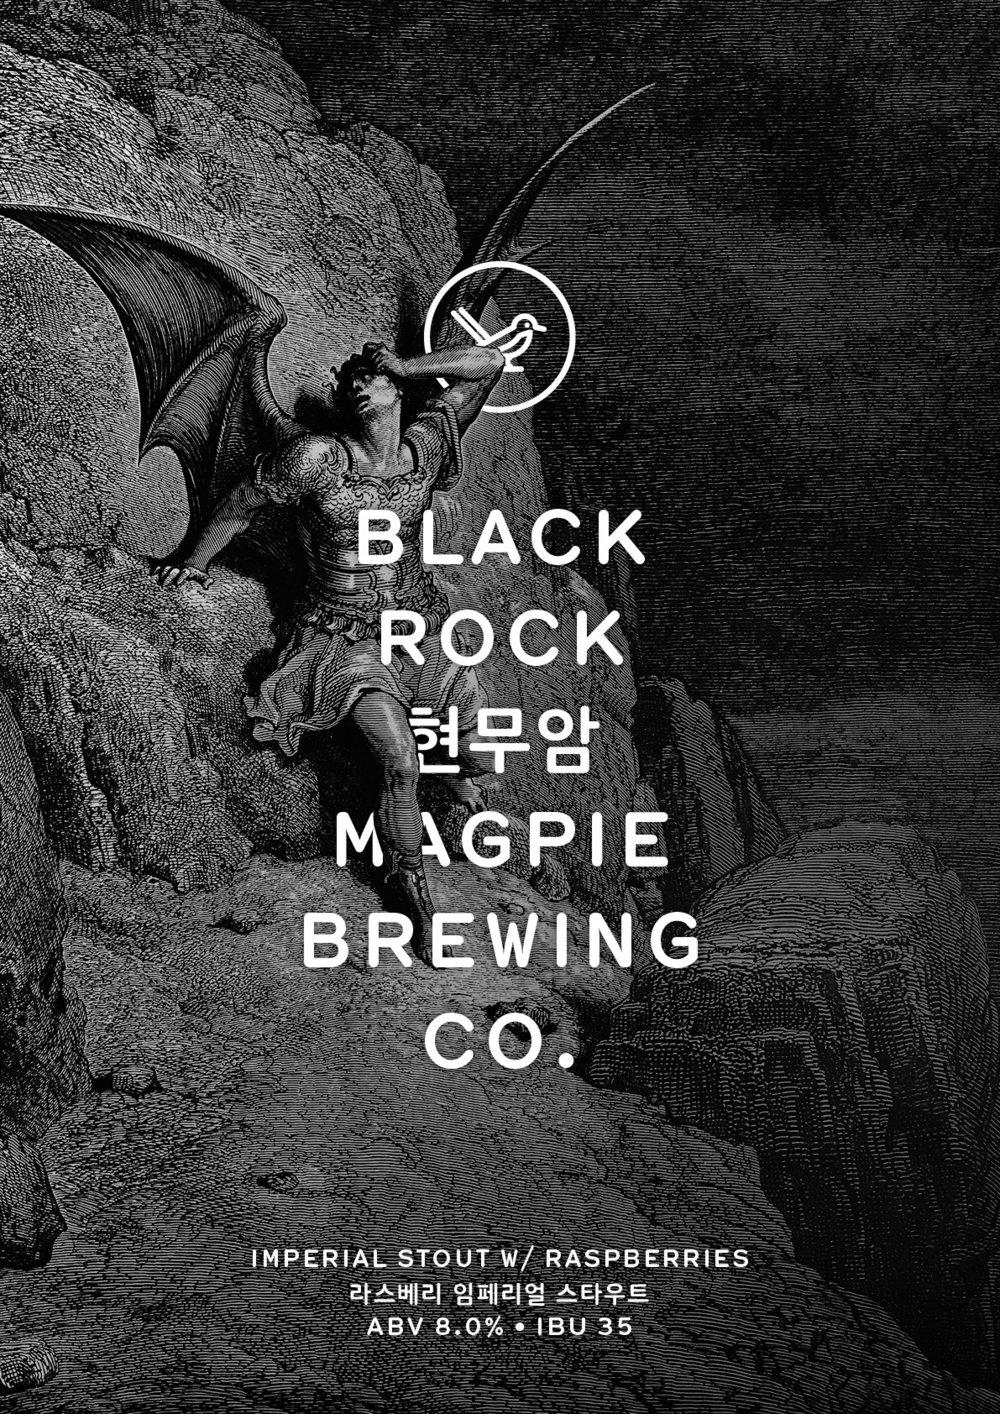 magpie-a1-blackrock.jpg